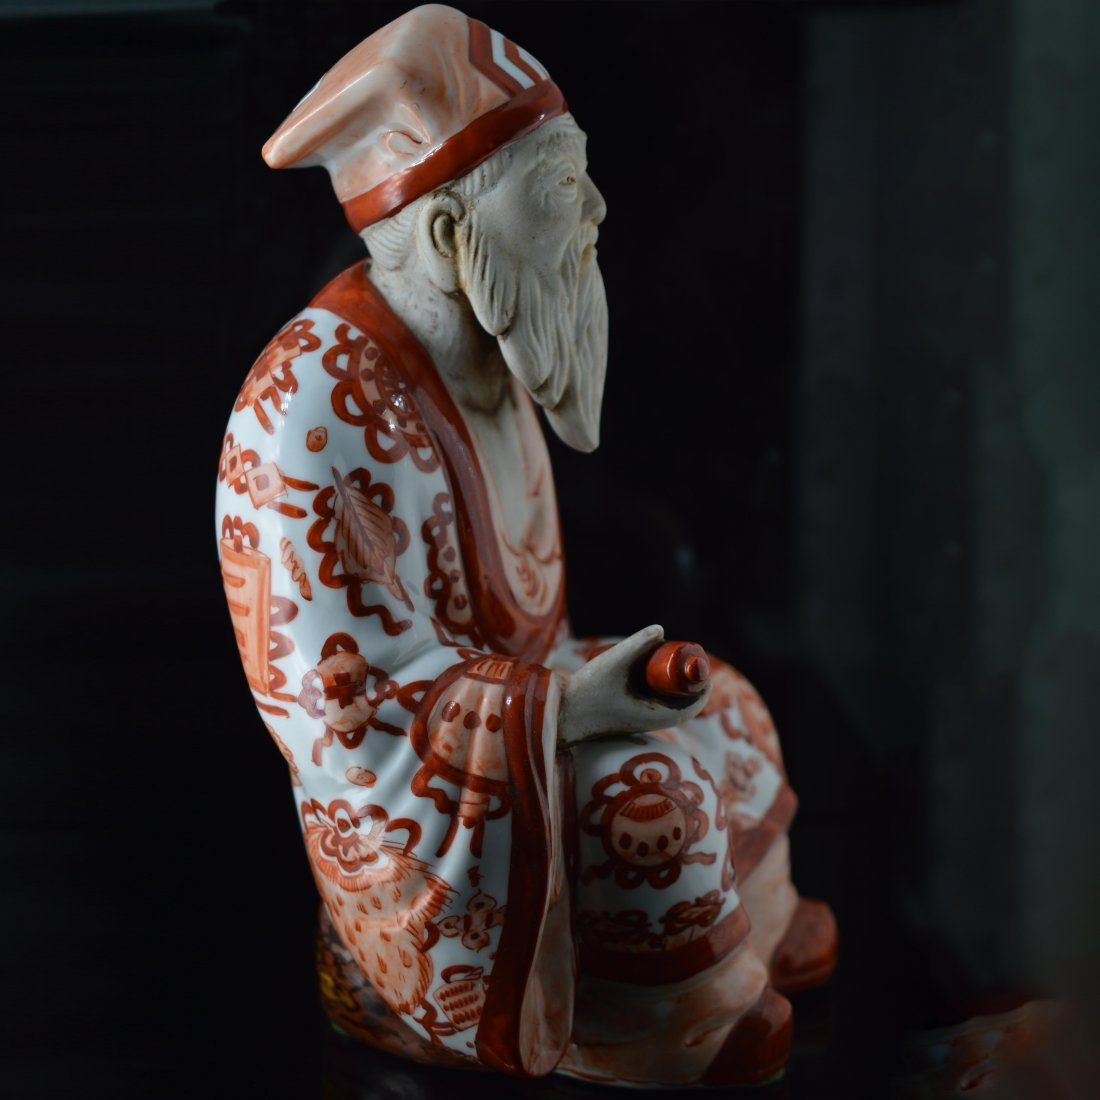 Red Glazed Japanese Porcelain Figure Ornament - 2